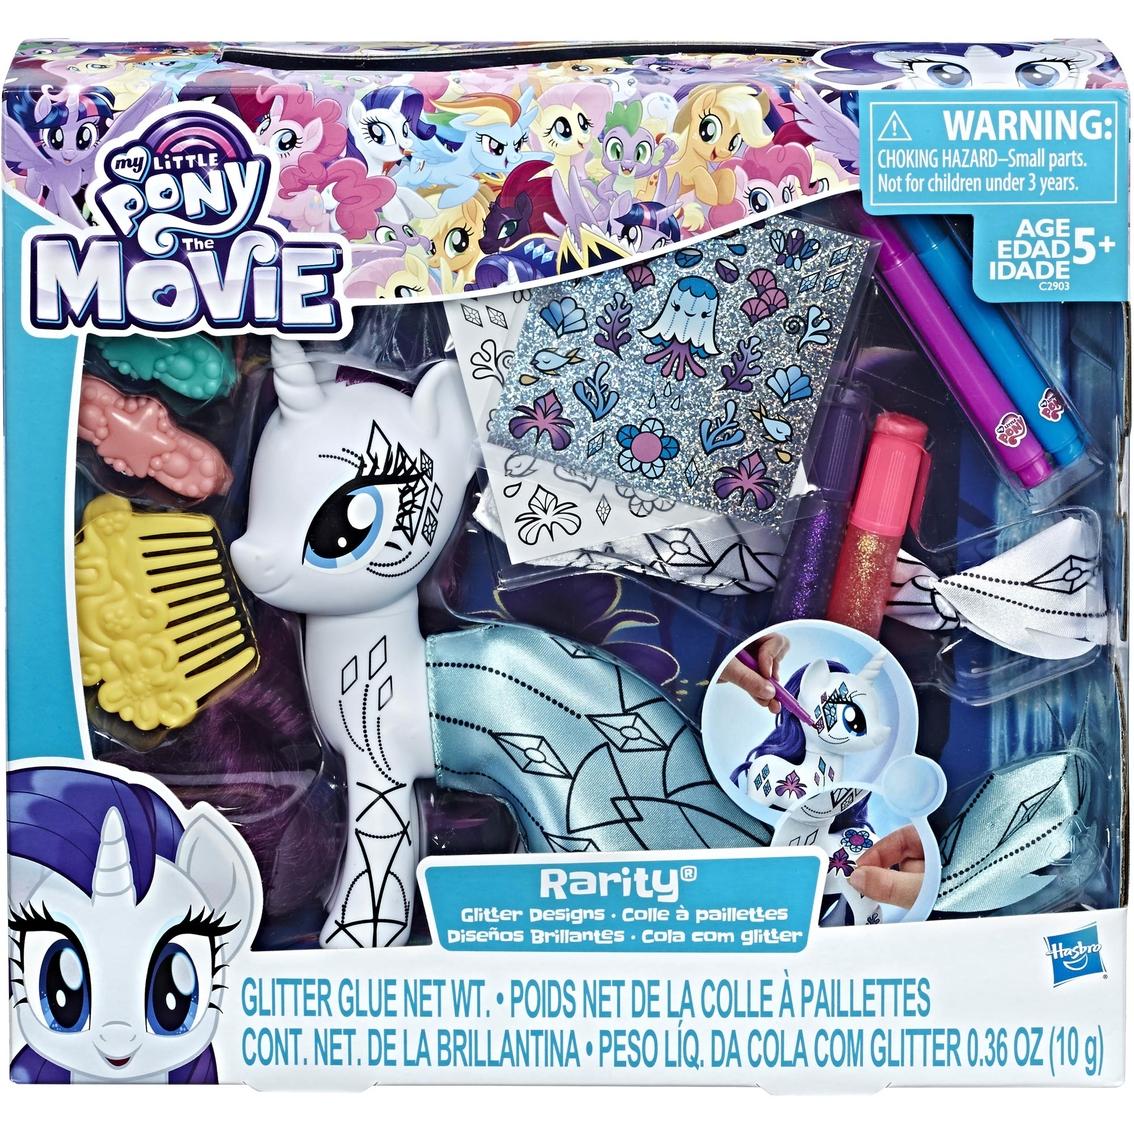 8854223ad1 My Little Pony The Movie Rarity Glitter Designs